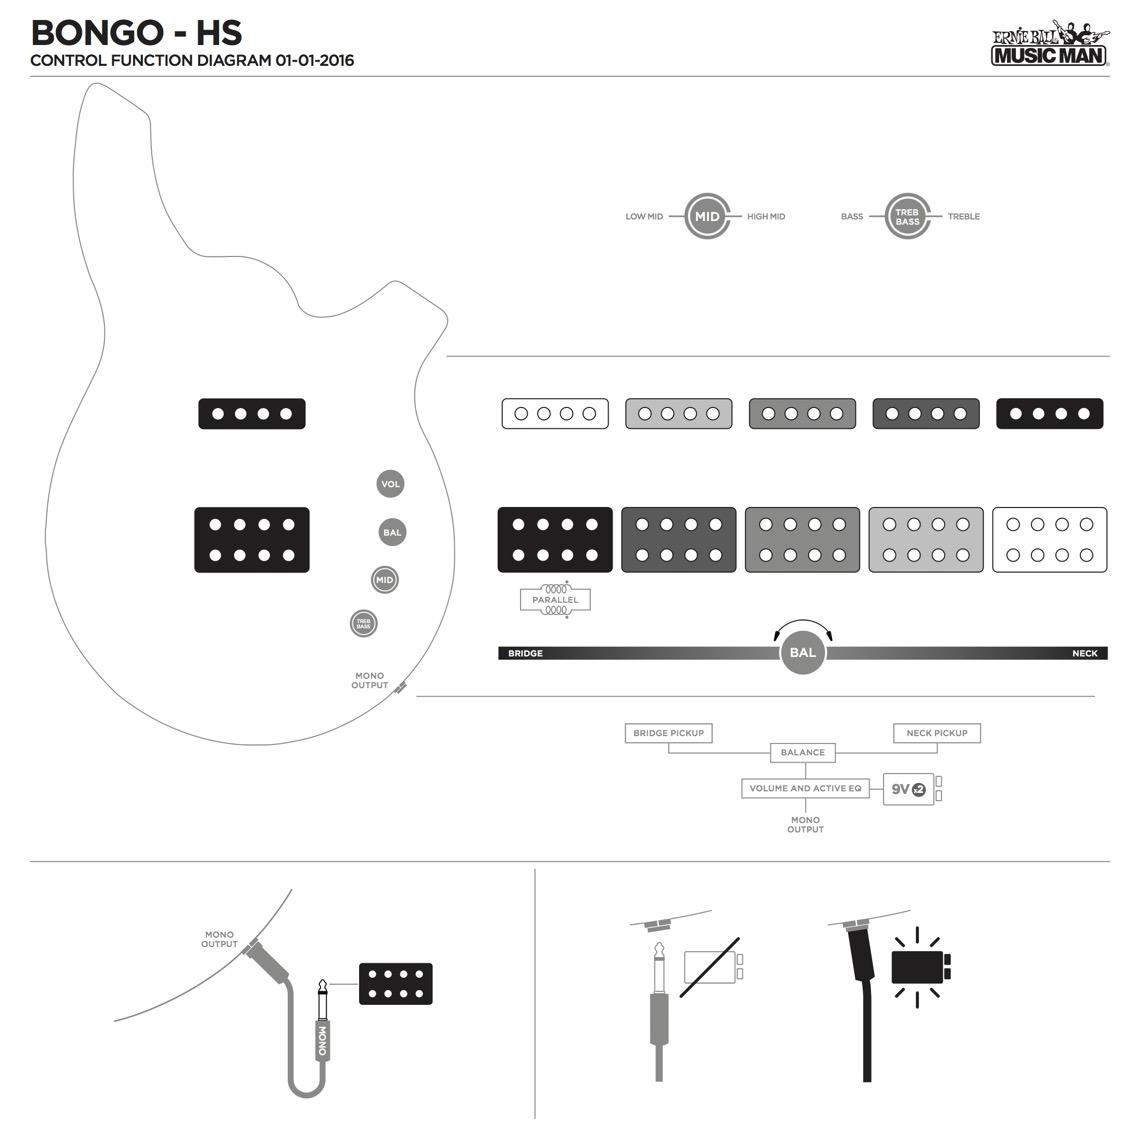 ernie ball guitar wiring diagram wiring diagram  fever brand guitar wiring diagrams #5